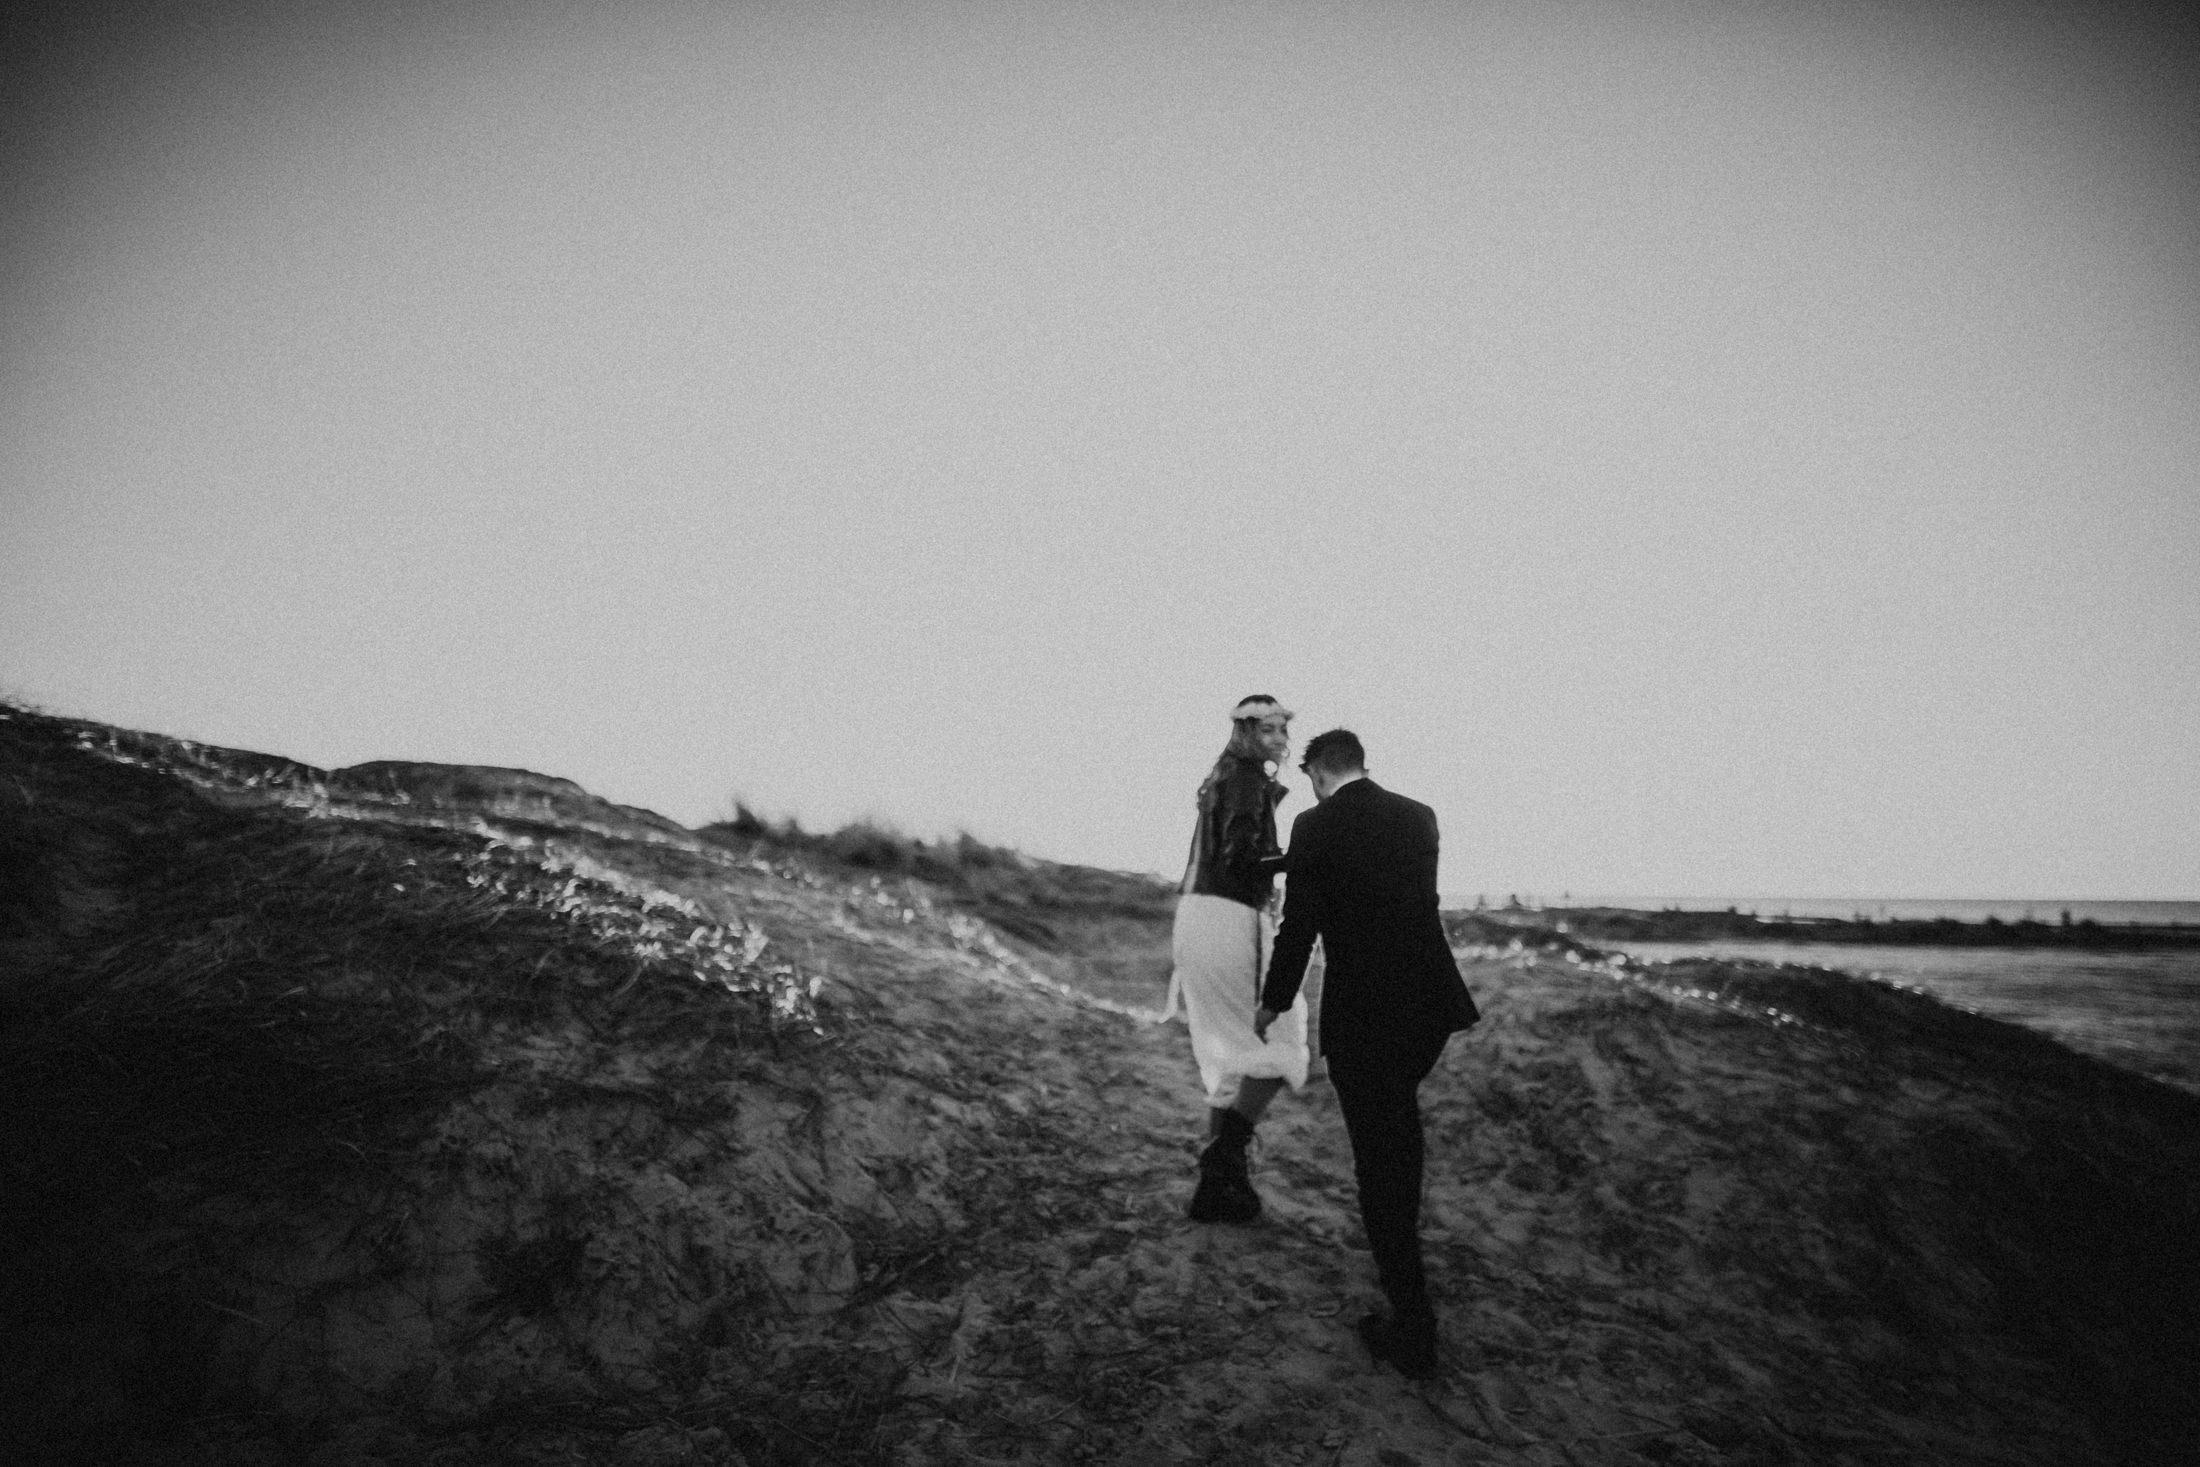 Wedding_Photographer_Mallorca_Daniela-Marquardt_Photography_CanaryIslands_Lanzarote_Iceland_Tuskany_Santorini_Portugal_Schweiz_Austria_Bayern_Elopement_Hochzeitsfotograf_Norddeichich_17